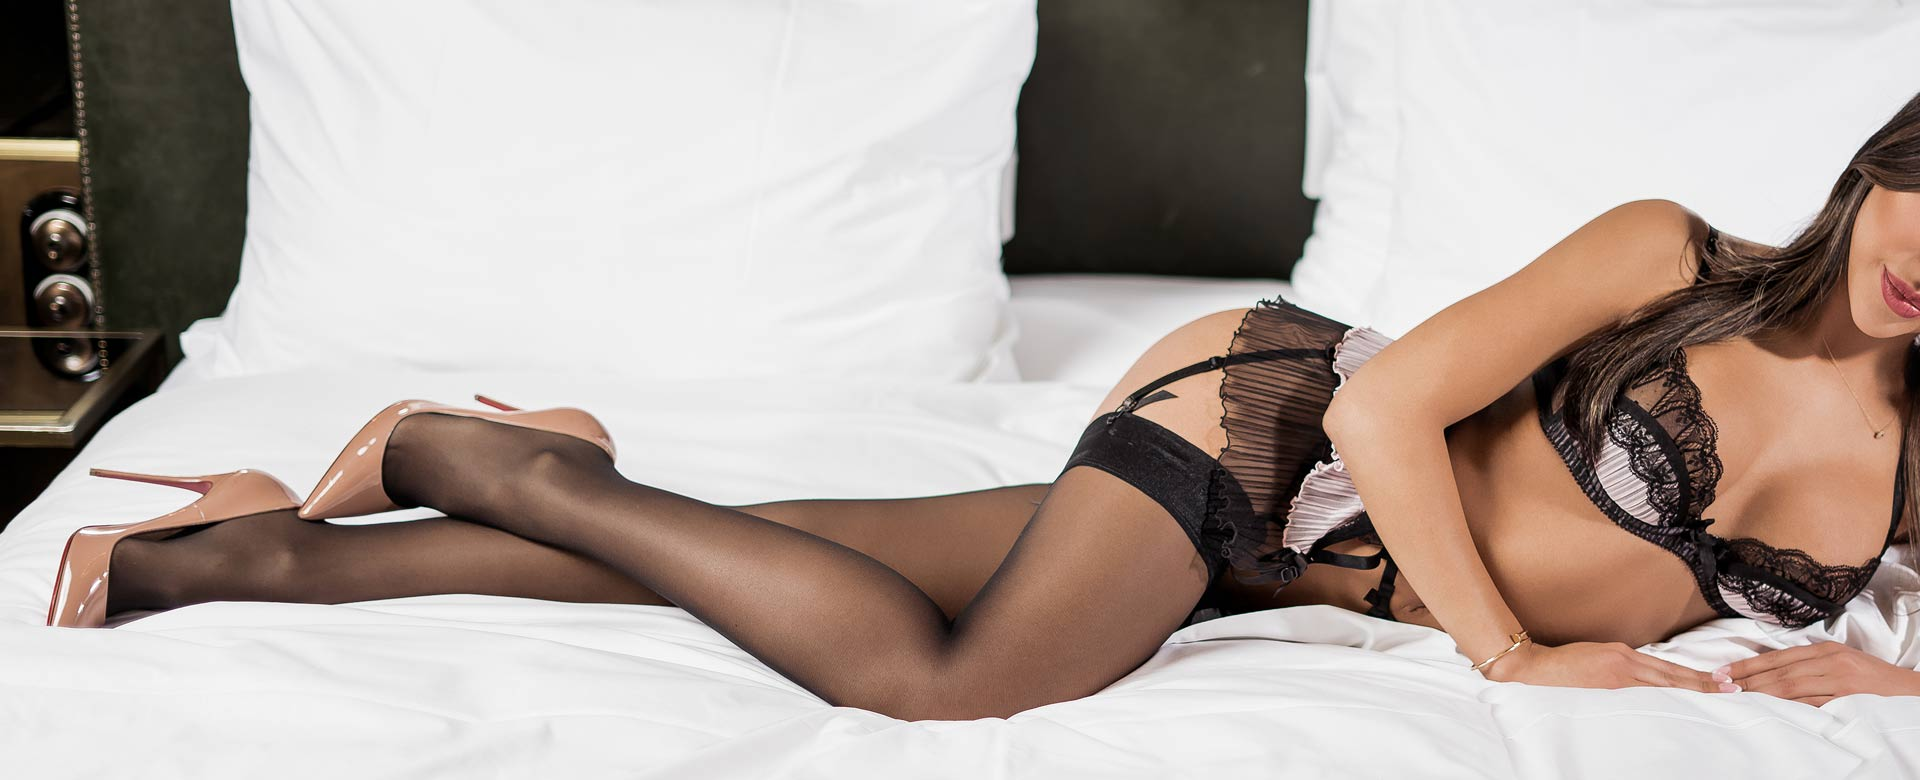 Bisexuelles Escort Model Saphira